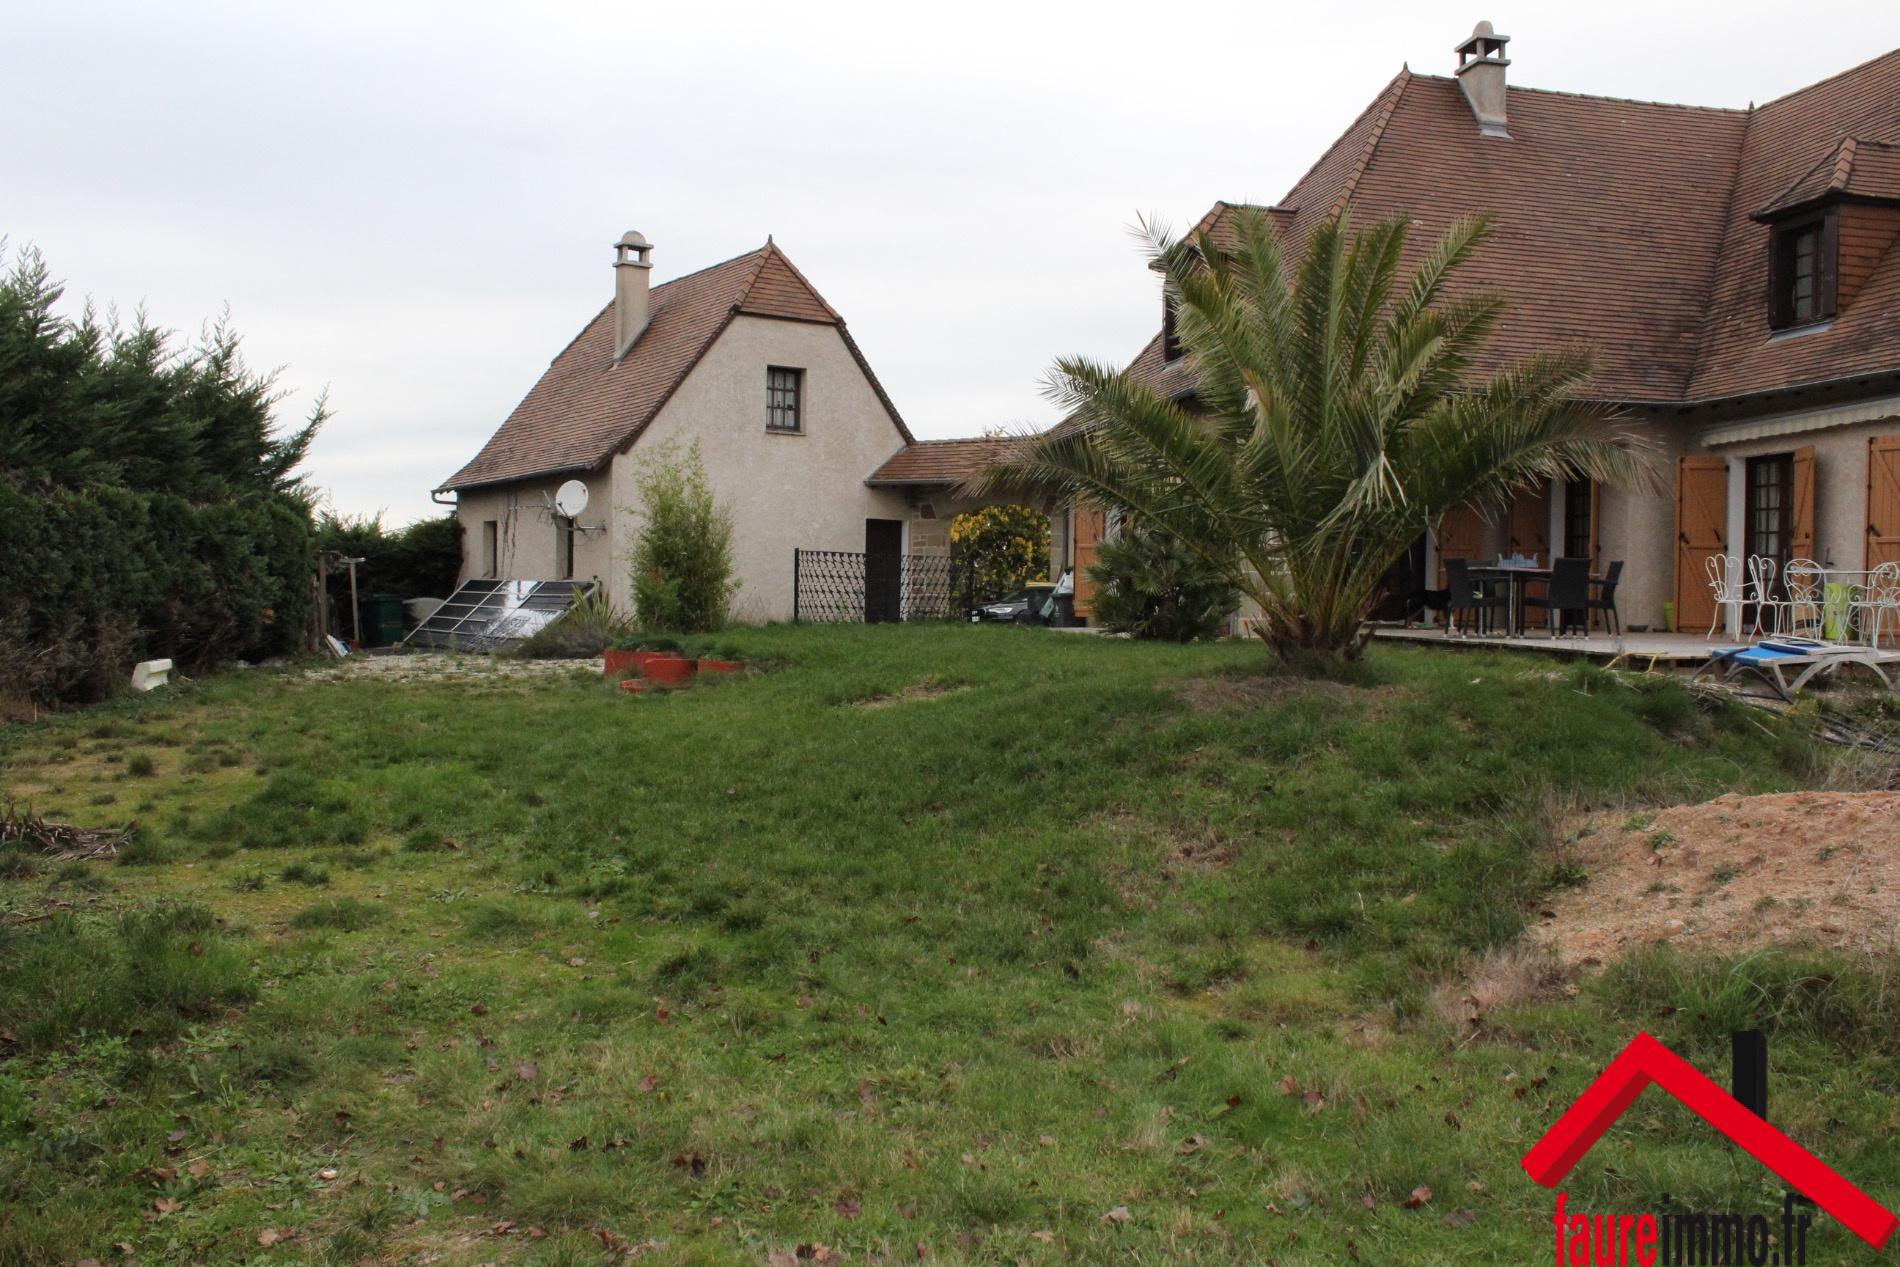 Vente maison a vendre a cosnac en correze 7 pieces - Maison a vendre en correze ...